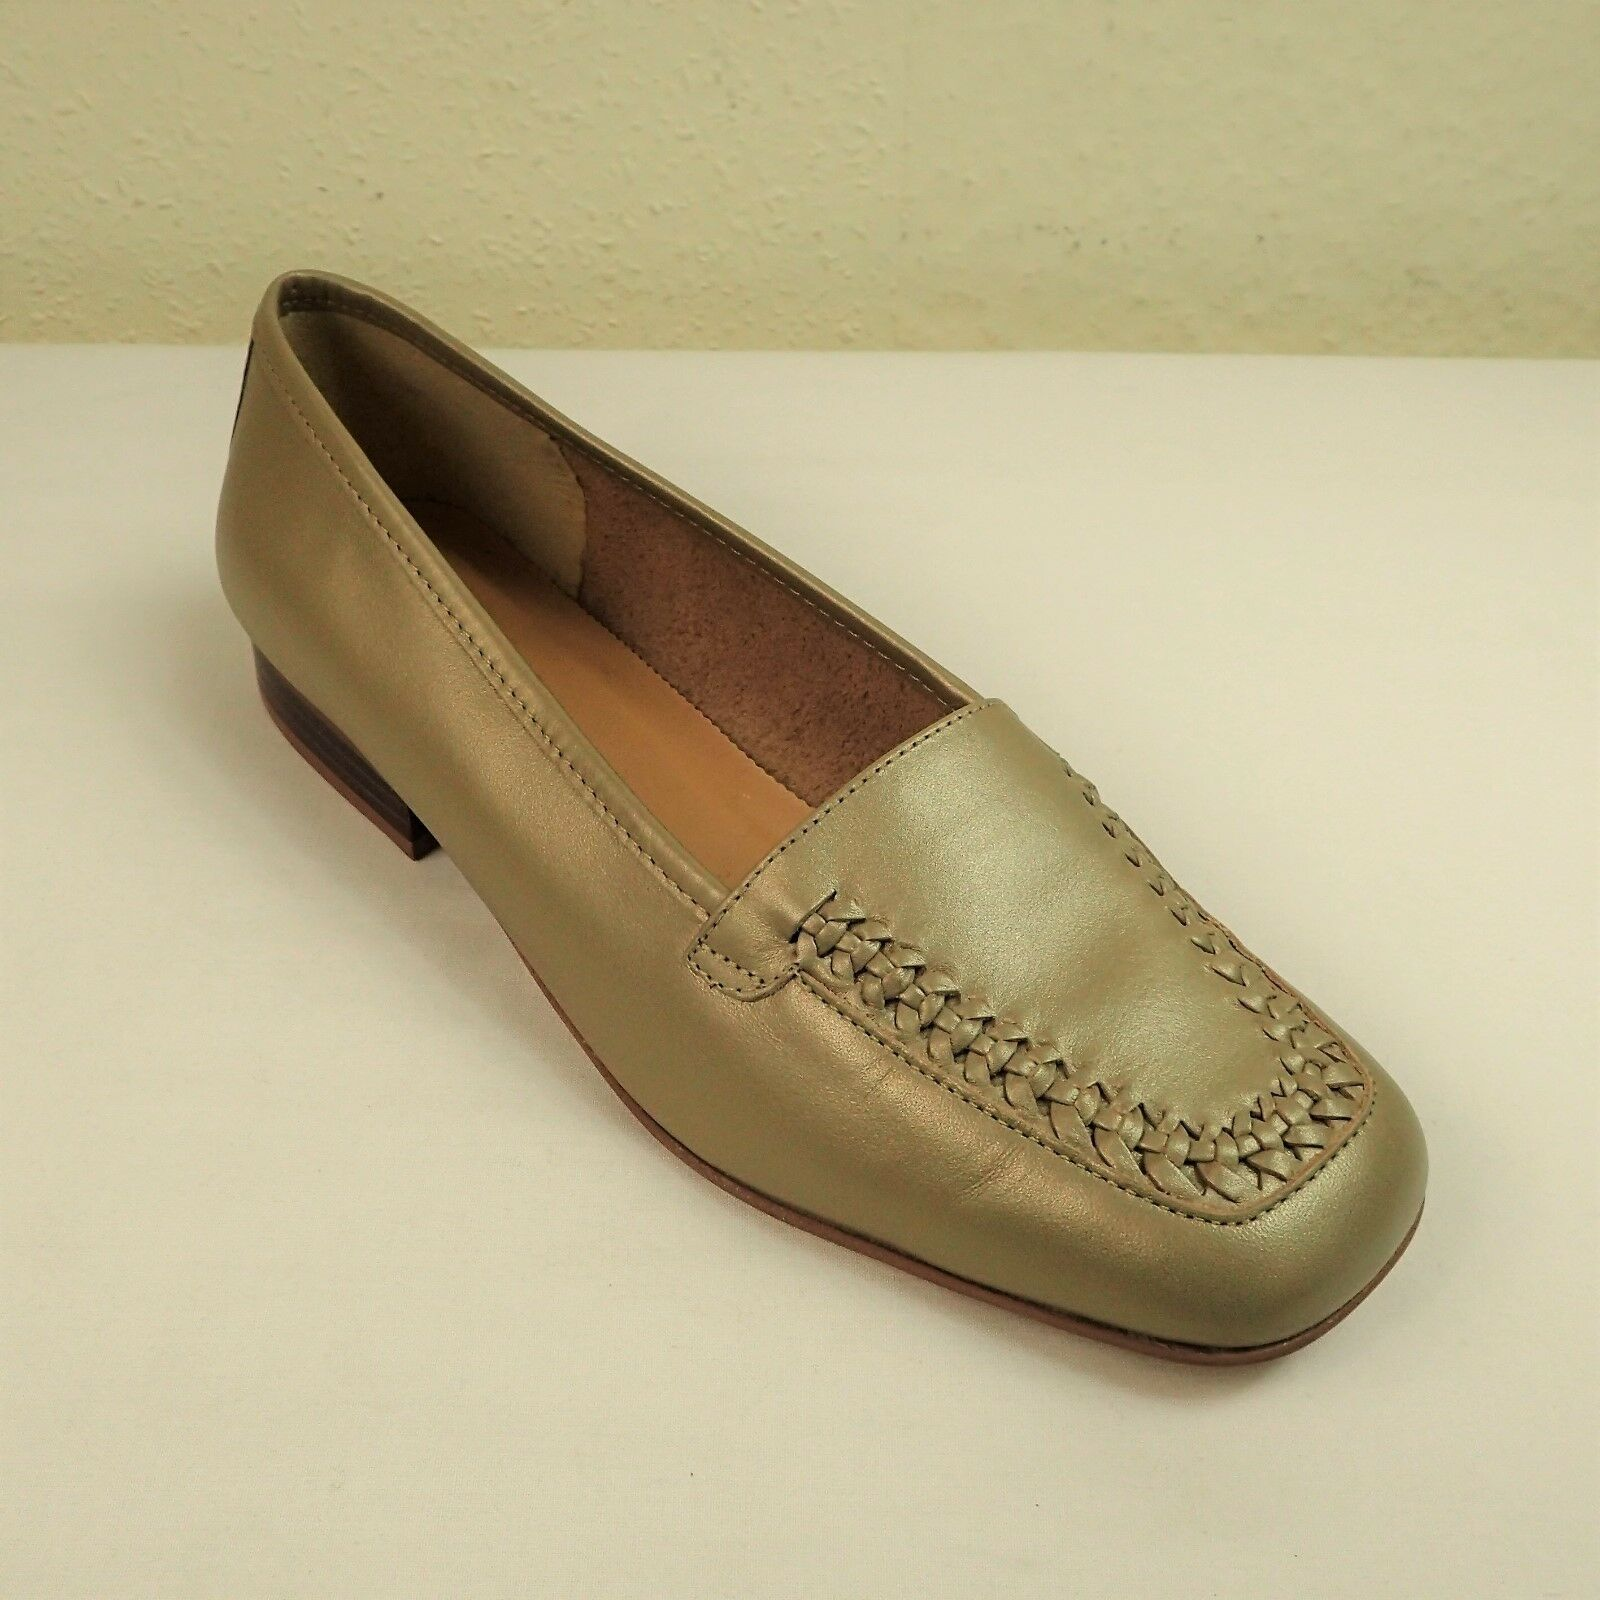 Clarks Clarks Clarks Hispaniol Sz UK 6 EU 39.5 Leather Flat Slip On Loafers shoes Metallic gold d2588e